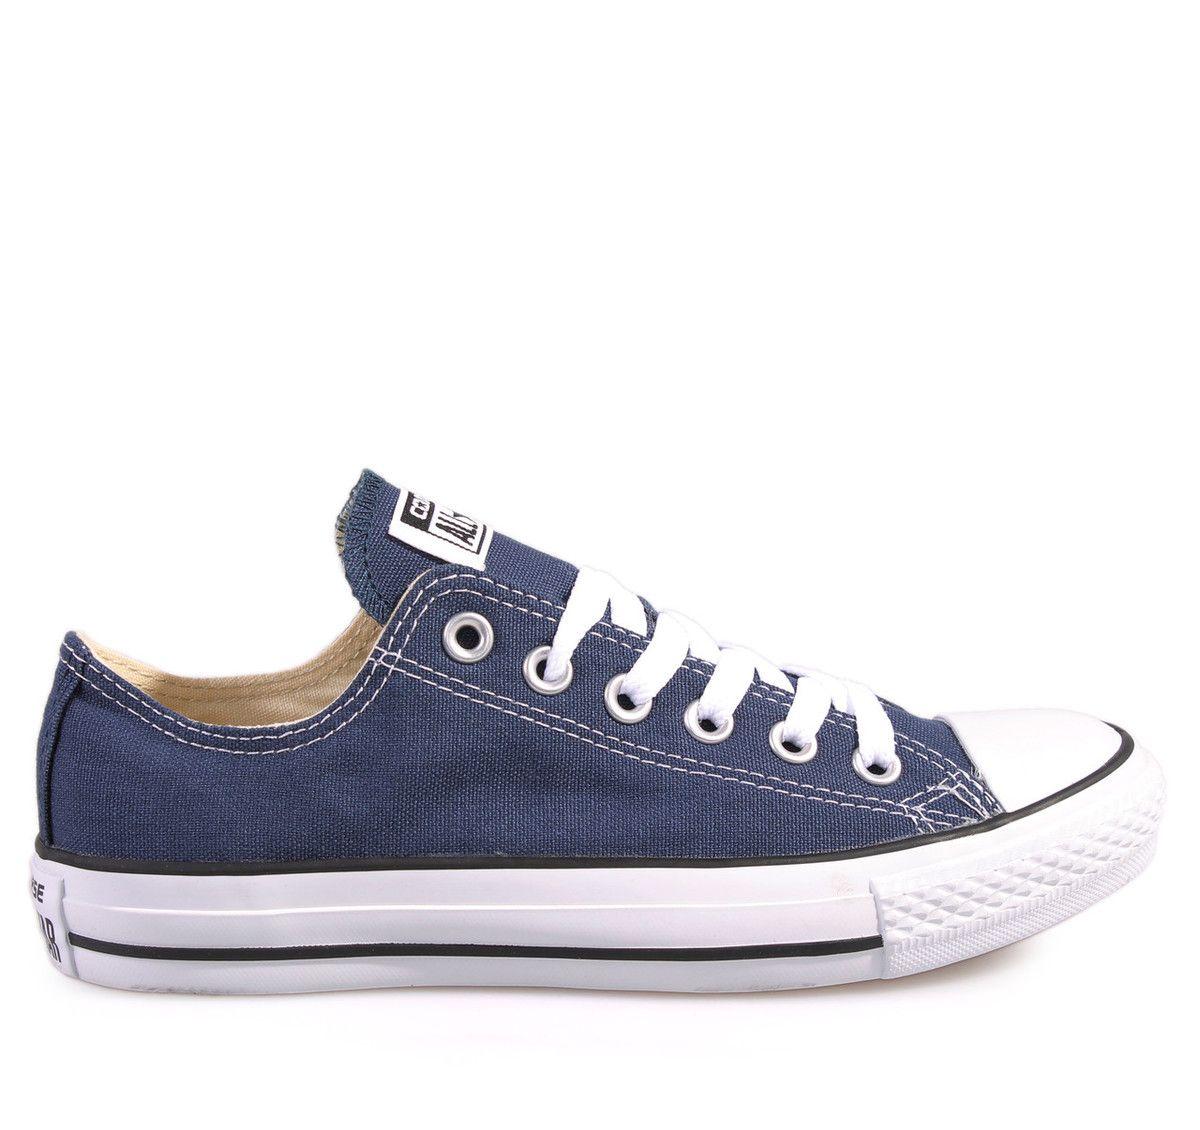 27206a11ea546c ... coupon for converse chuck taylor unisex low cut dark blue sneakers  m9697c. c1747 4abdf